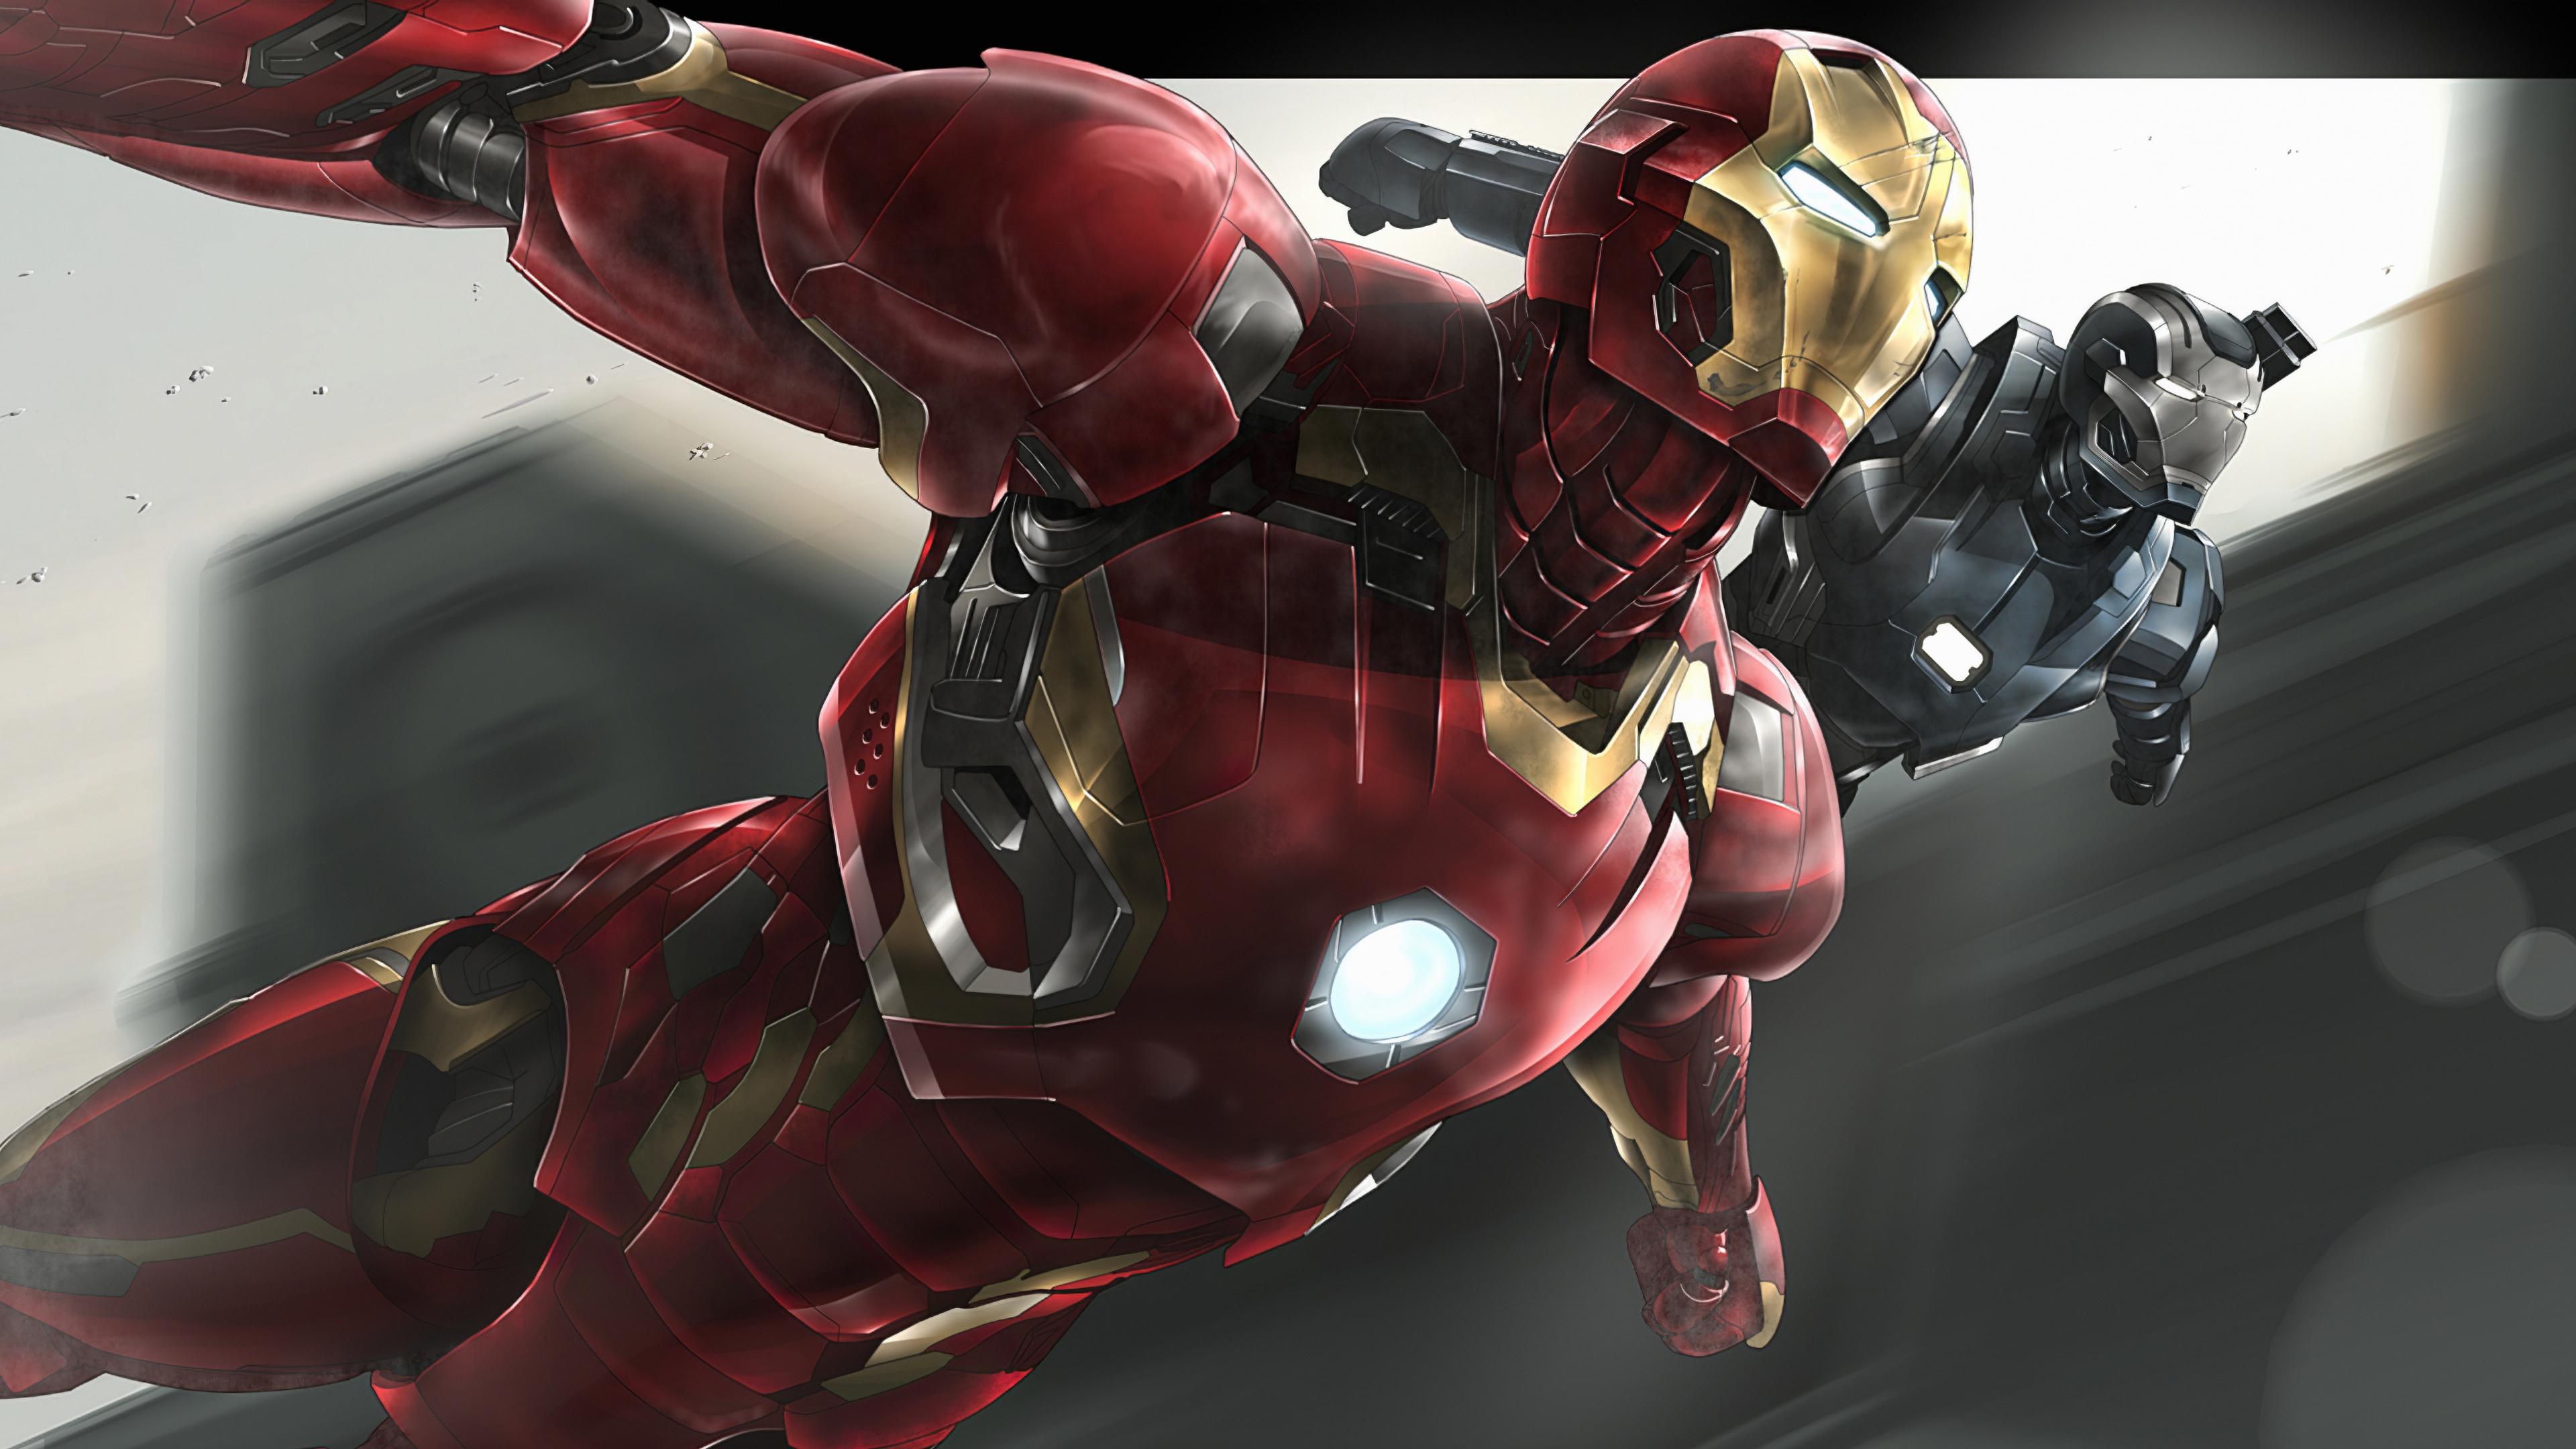 iron man war machine art 1572367796 - Iron Man War Machine Art - superheroes wallpapers, iron man wallpapers, hd-wallpapers, digital art wallpapers, artwork wallpapers, 4k-wallpapers